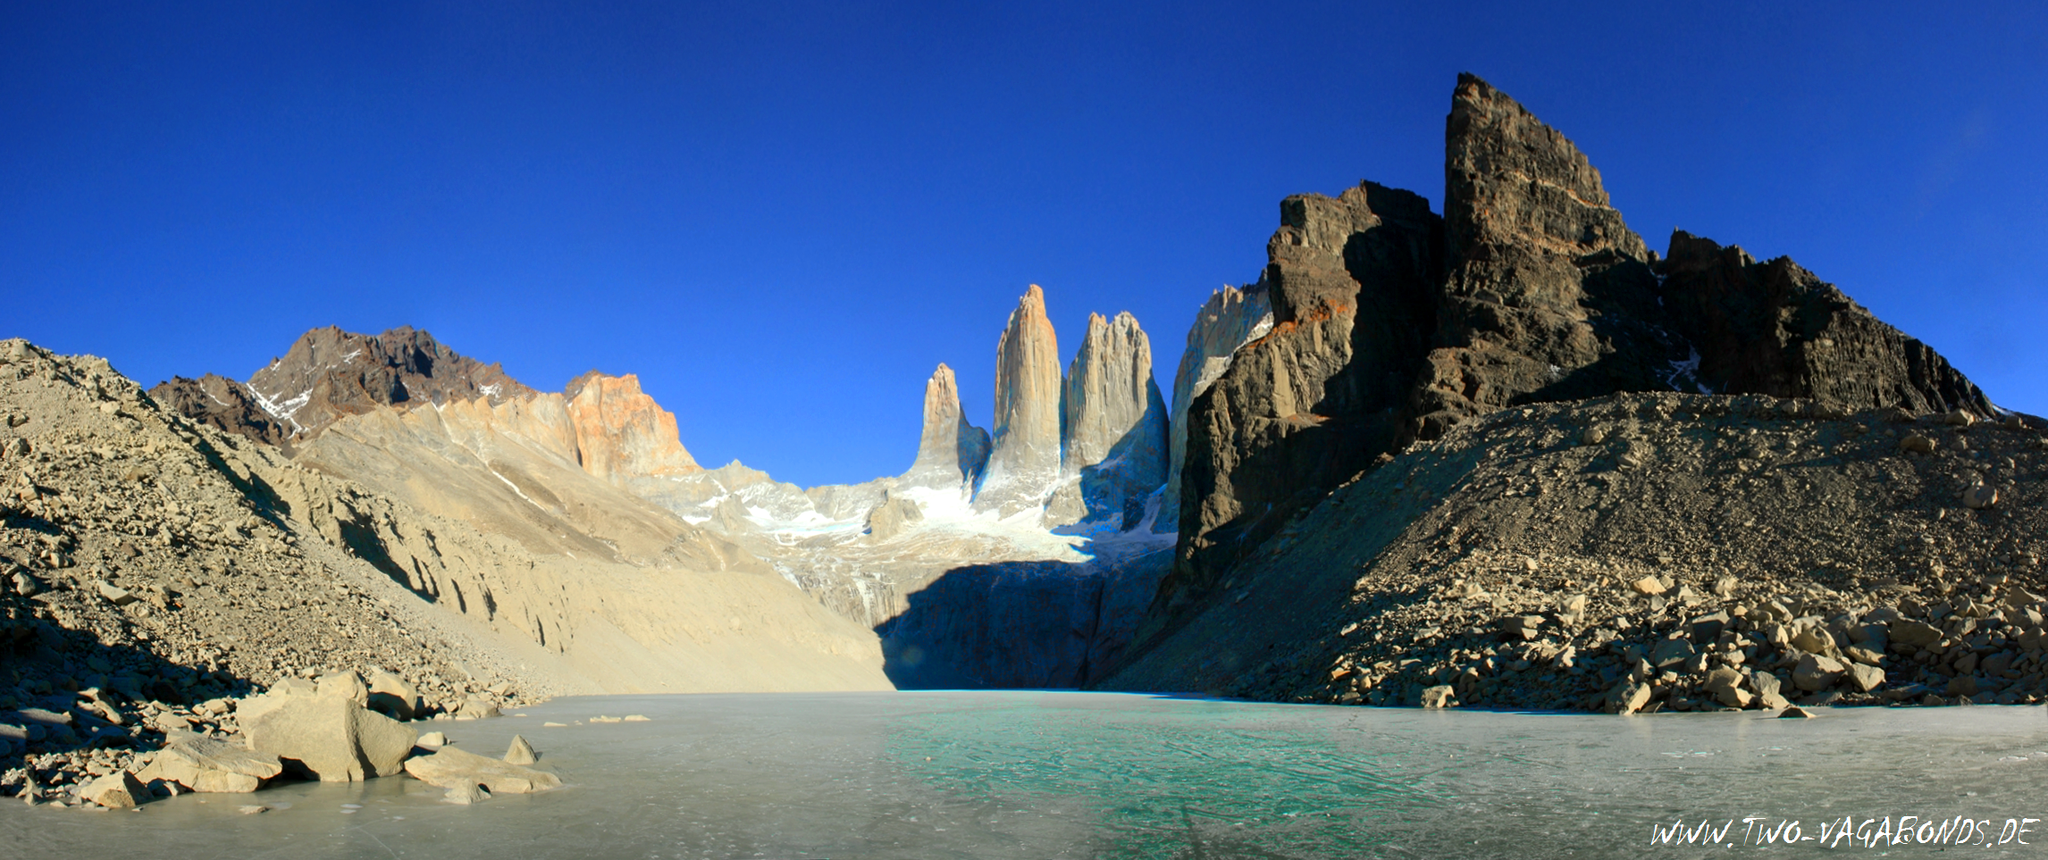 CHILE 2016 - PATAGONIEN - TORRES DEL PAINE NP - TORRES LOOKOUT